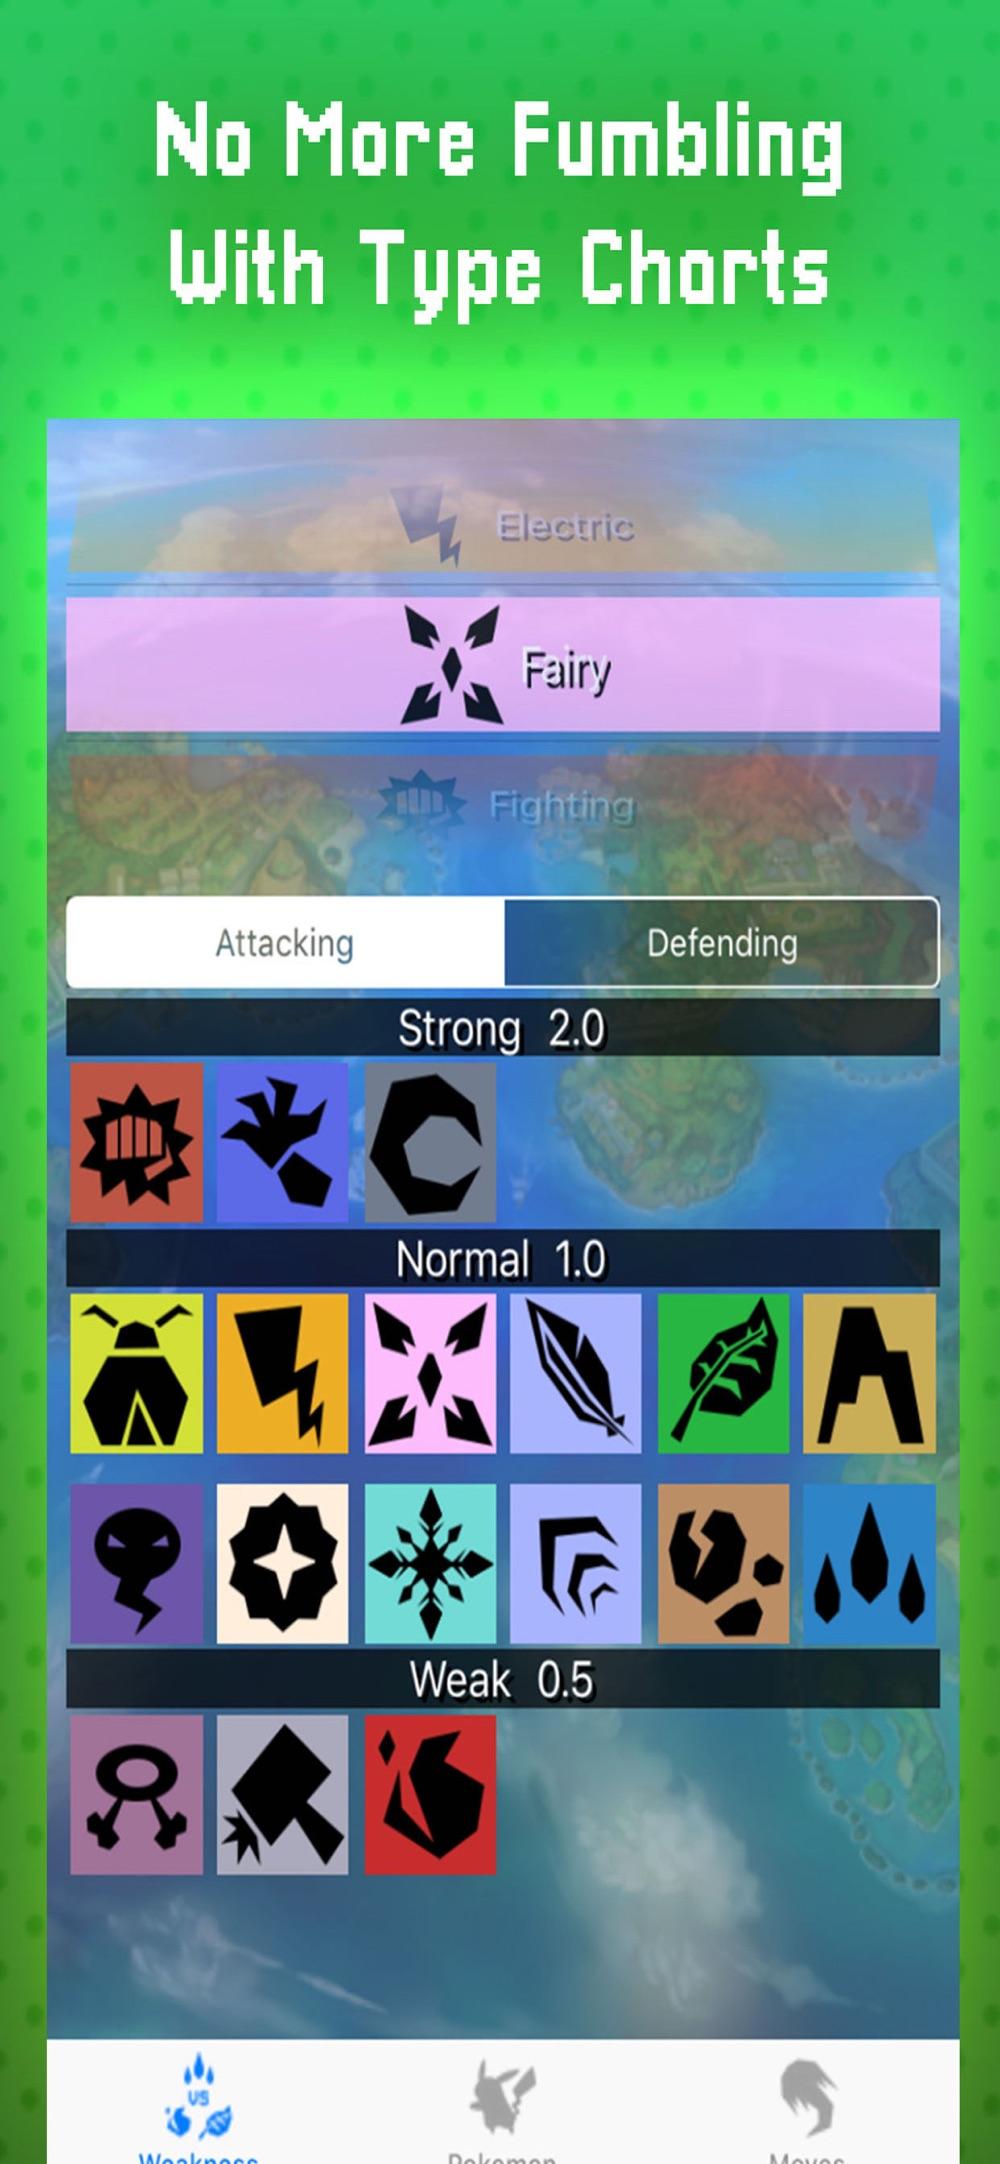 Poke Battle Guide To Weakness Cheat Codes